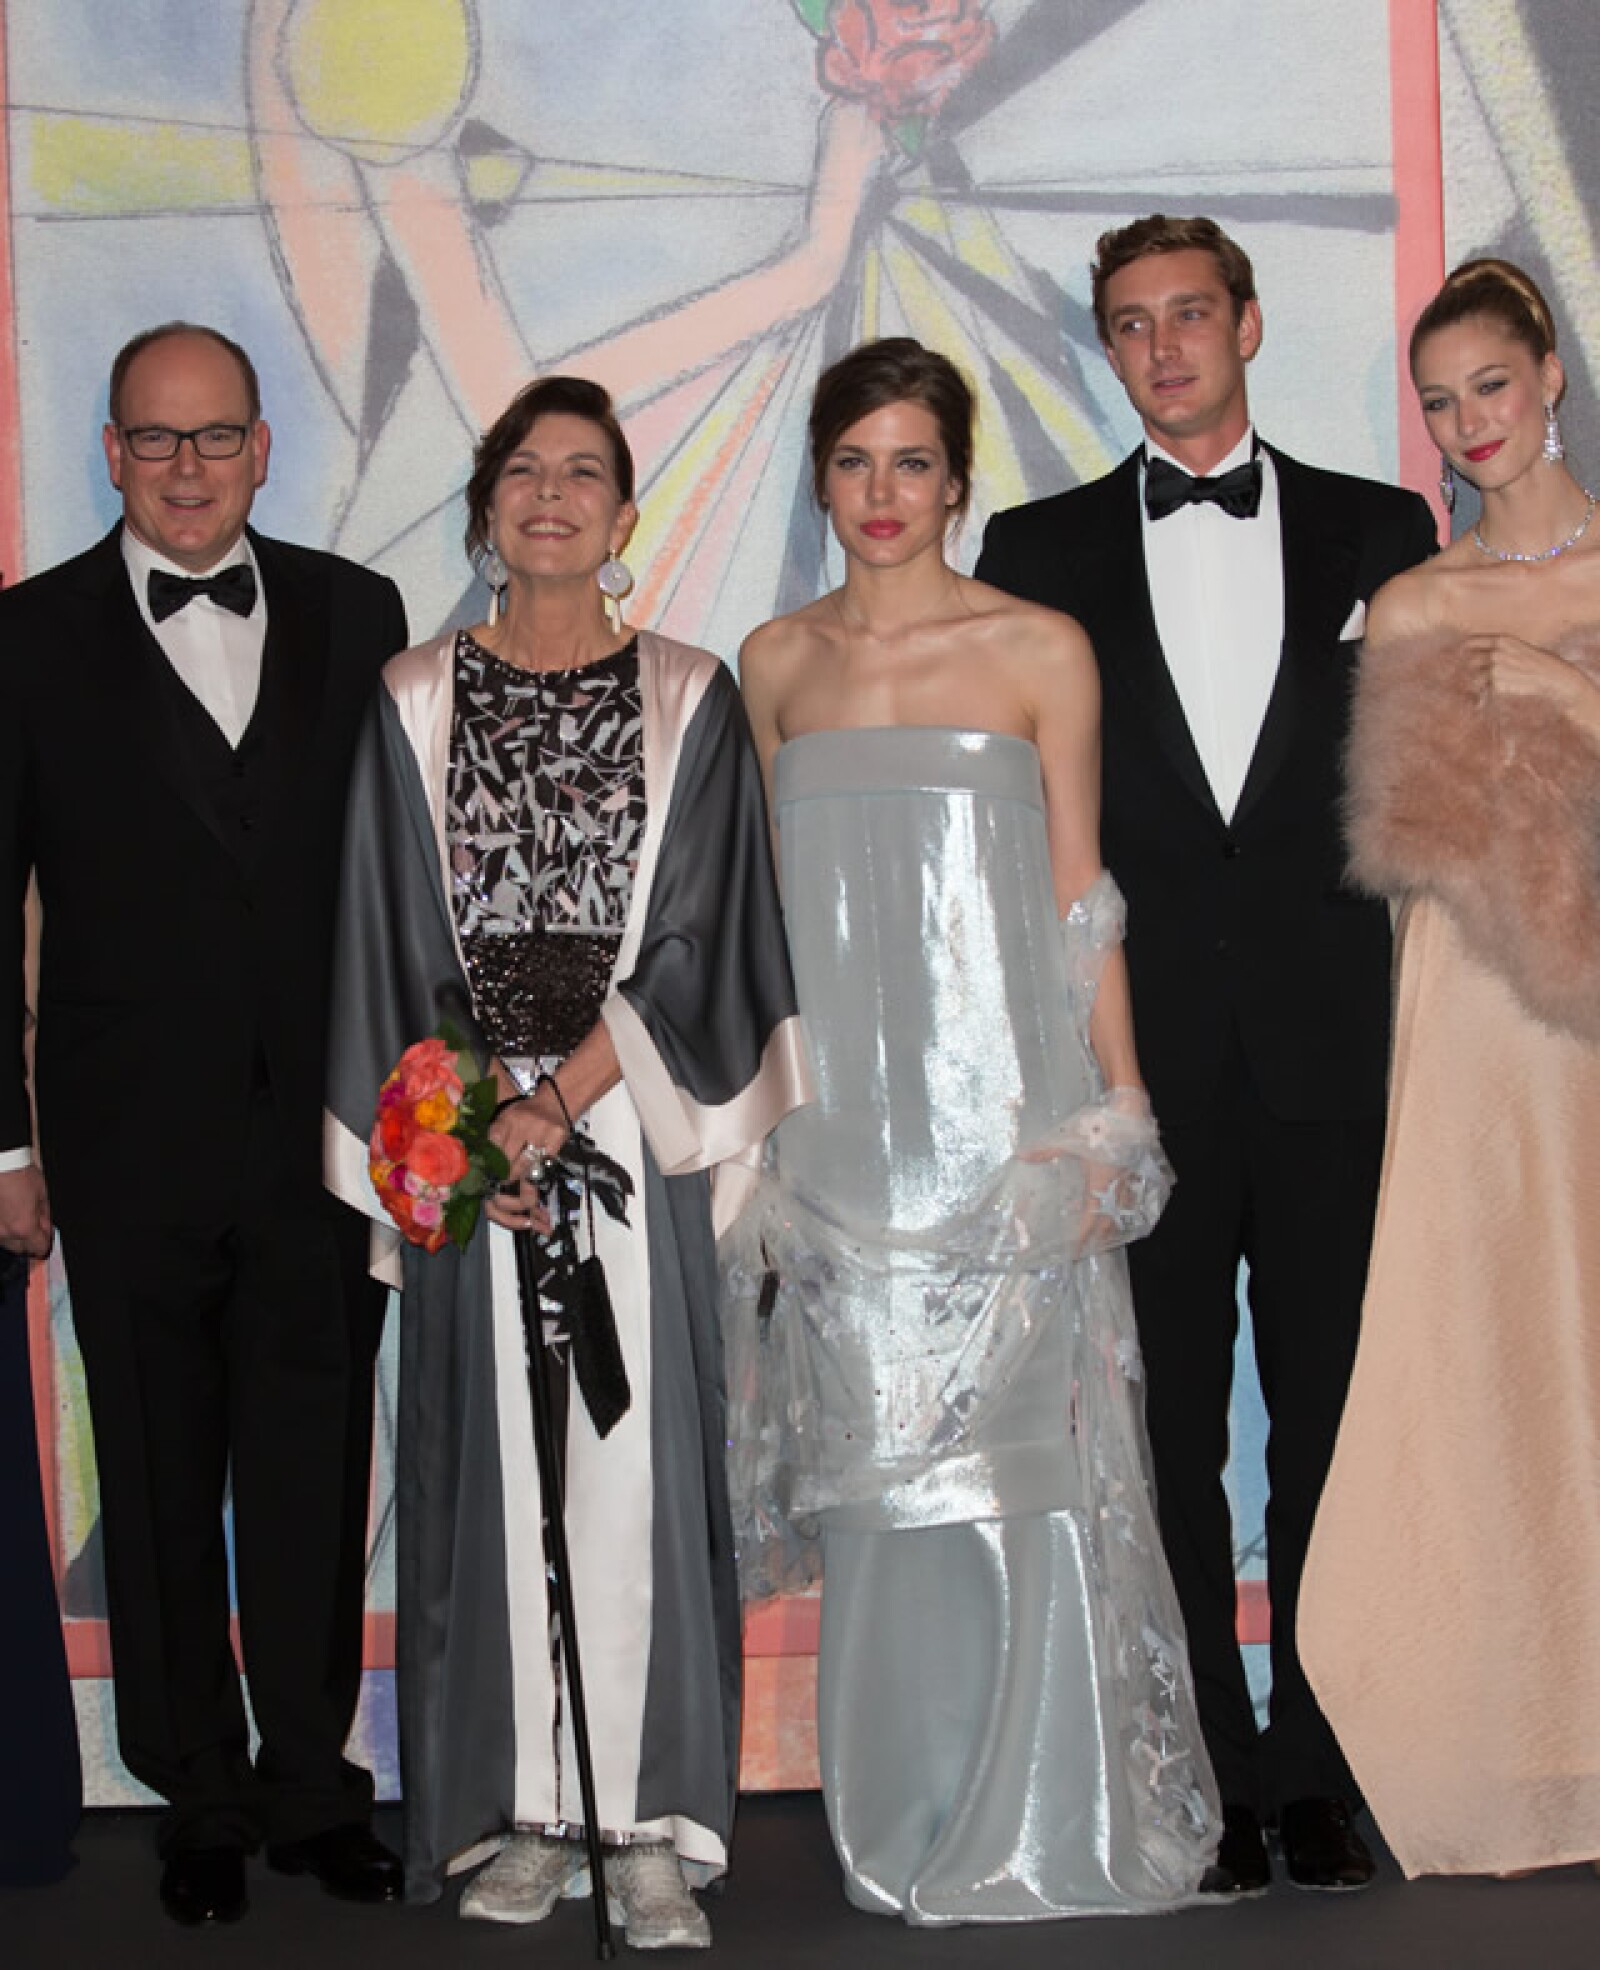 Princesa Carolina de Mónaco, Carlota Casiraghi, Pierre Casiraghi y Beatrice Borromeo.